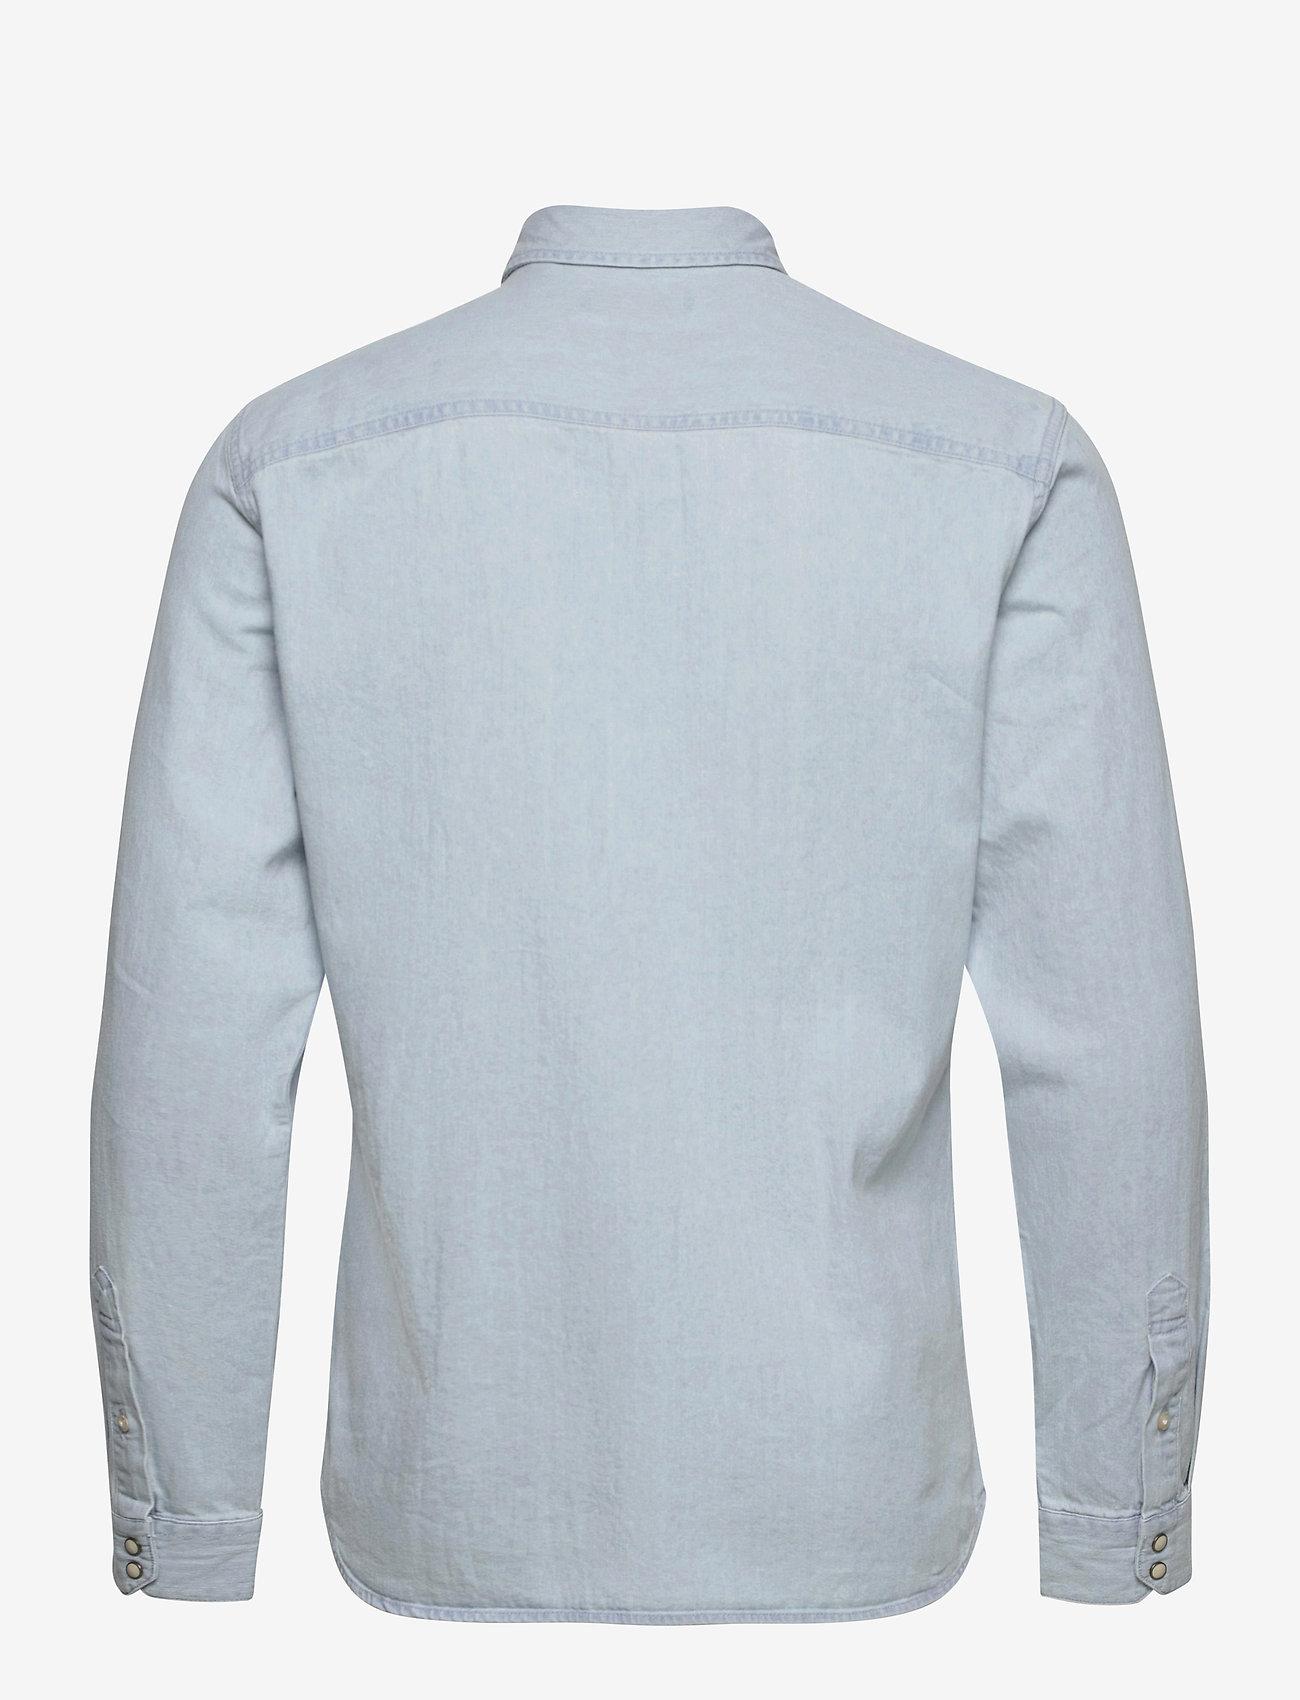 Jack & Jones - JJESHERIDAN SHIRT L/S - jeansskjortor - light blue denim - 1